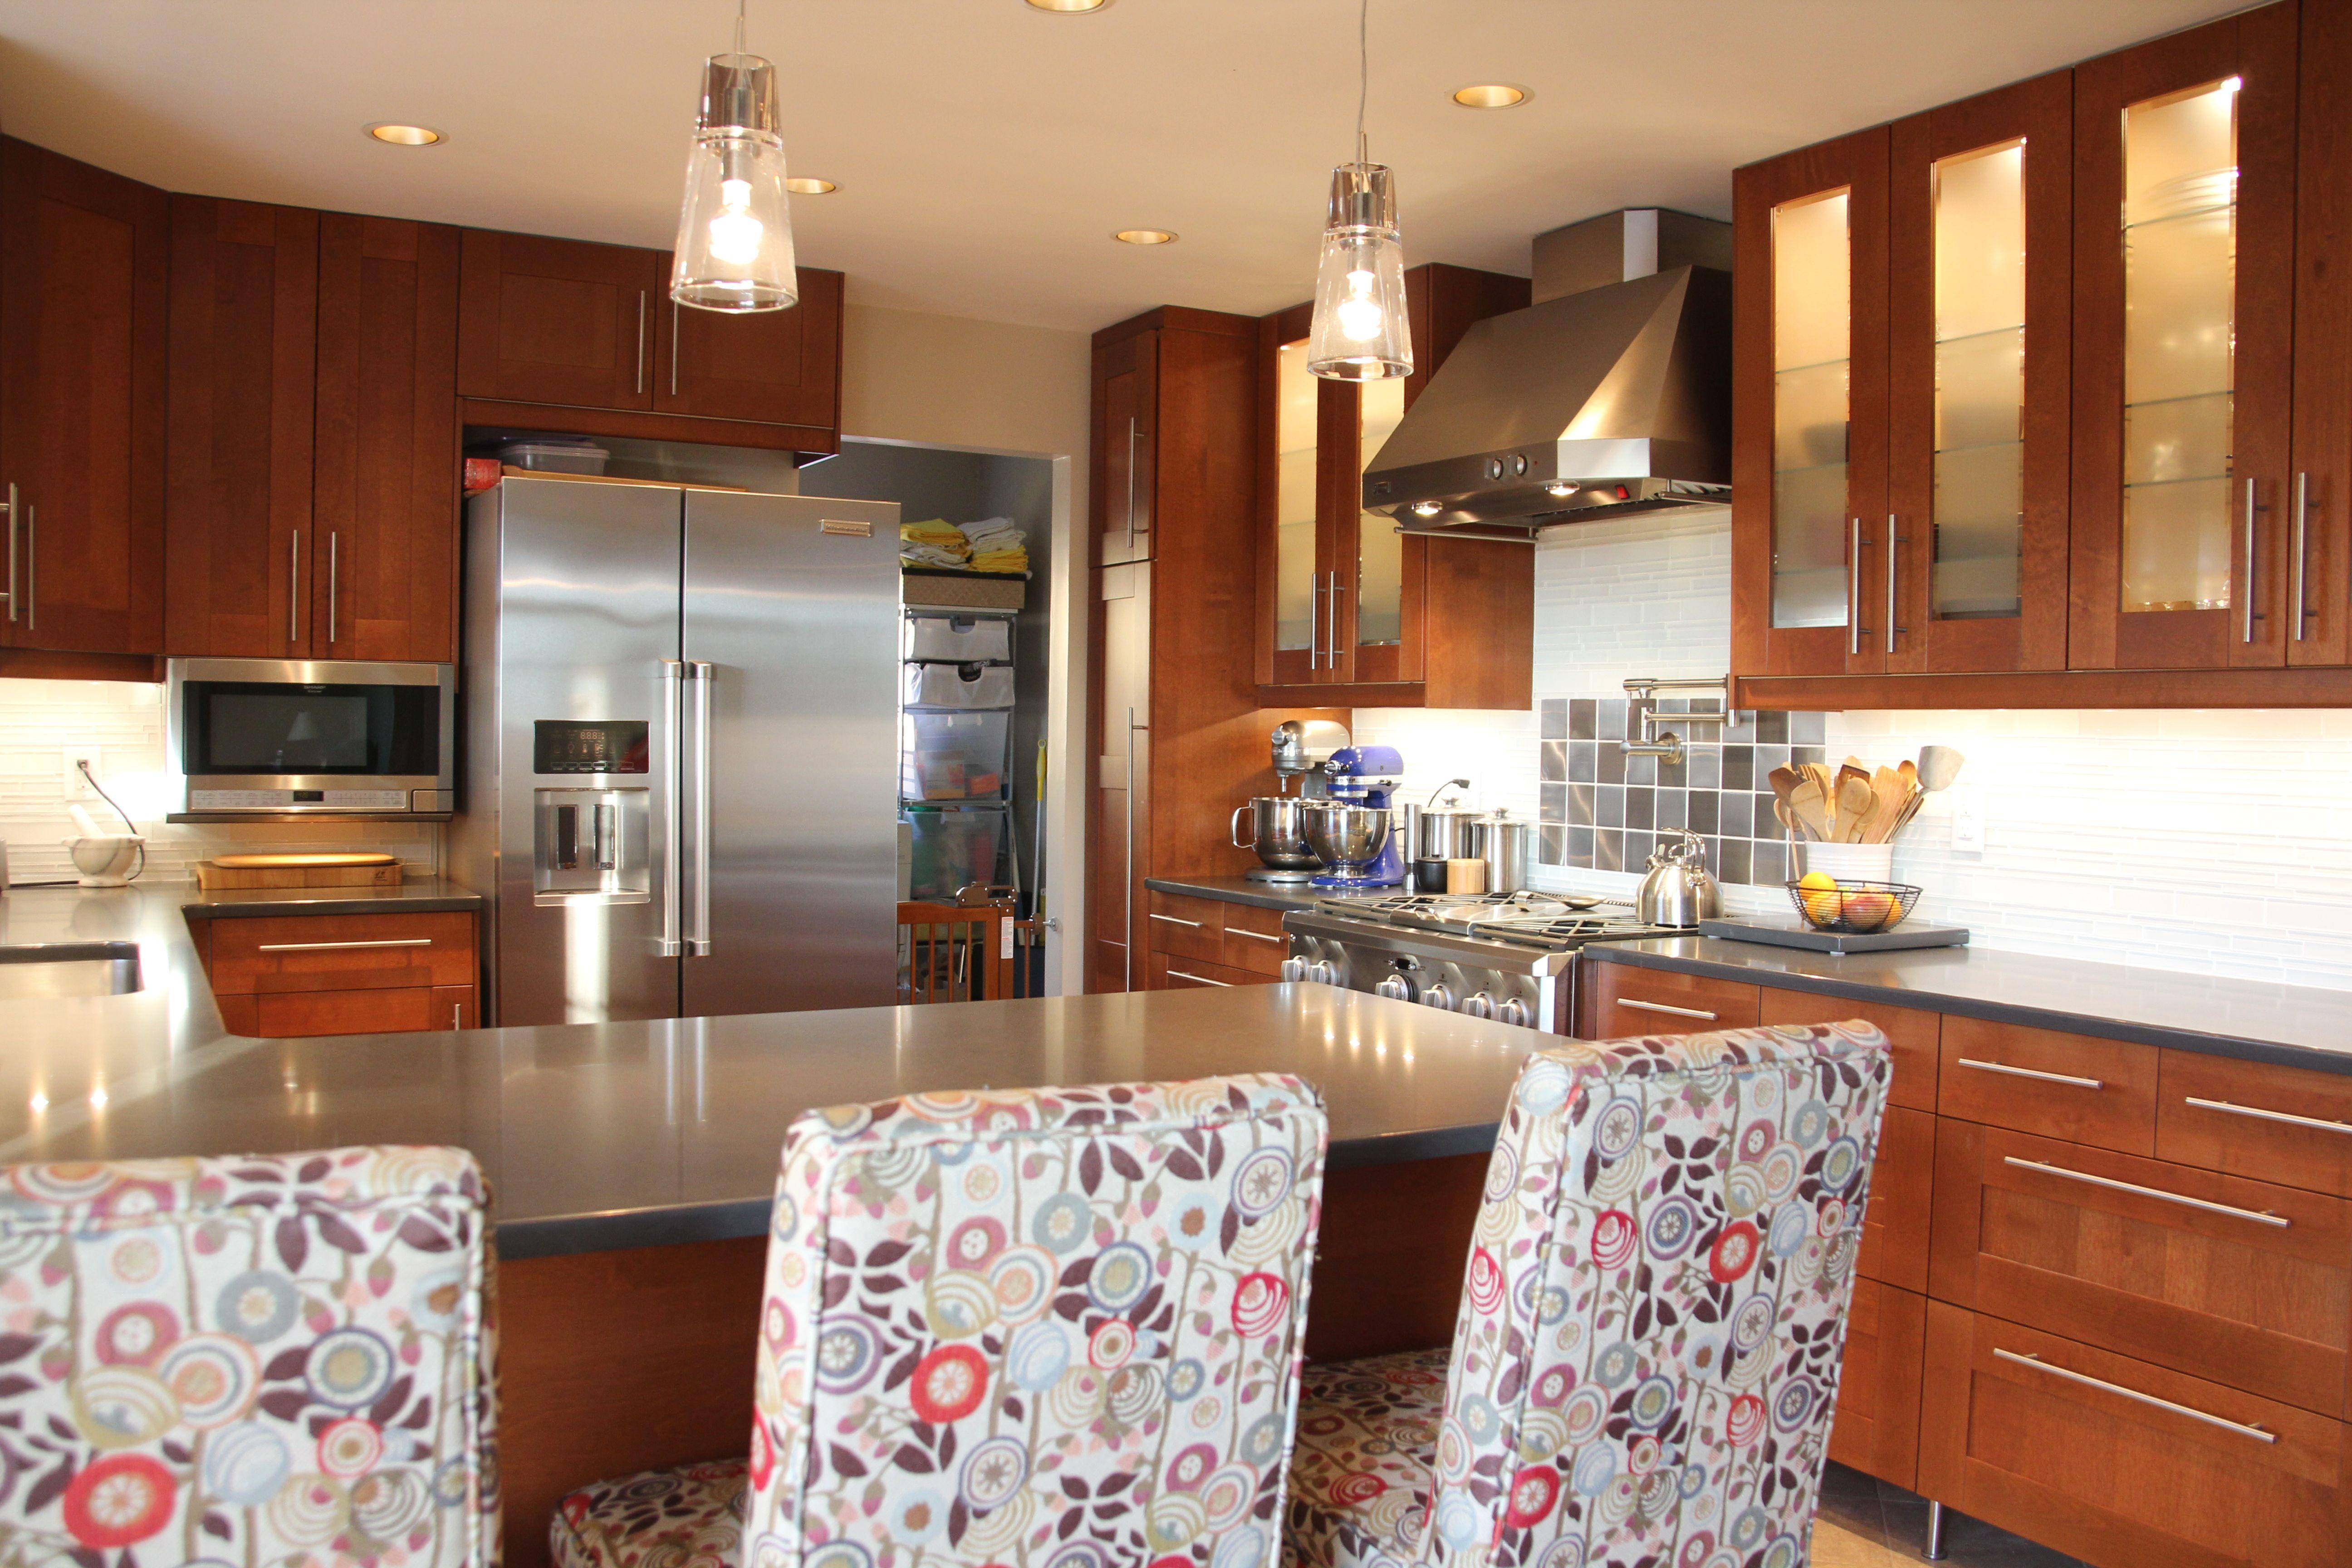 Finished Kitchen! Ikea Adel Medium Brown, Caesarstone Raven quartz, Pier One barstools